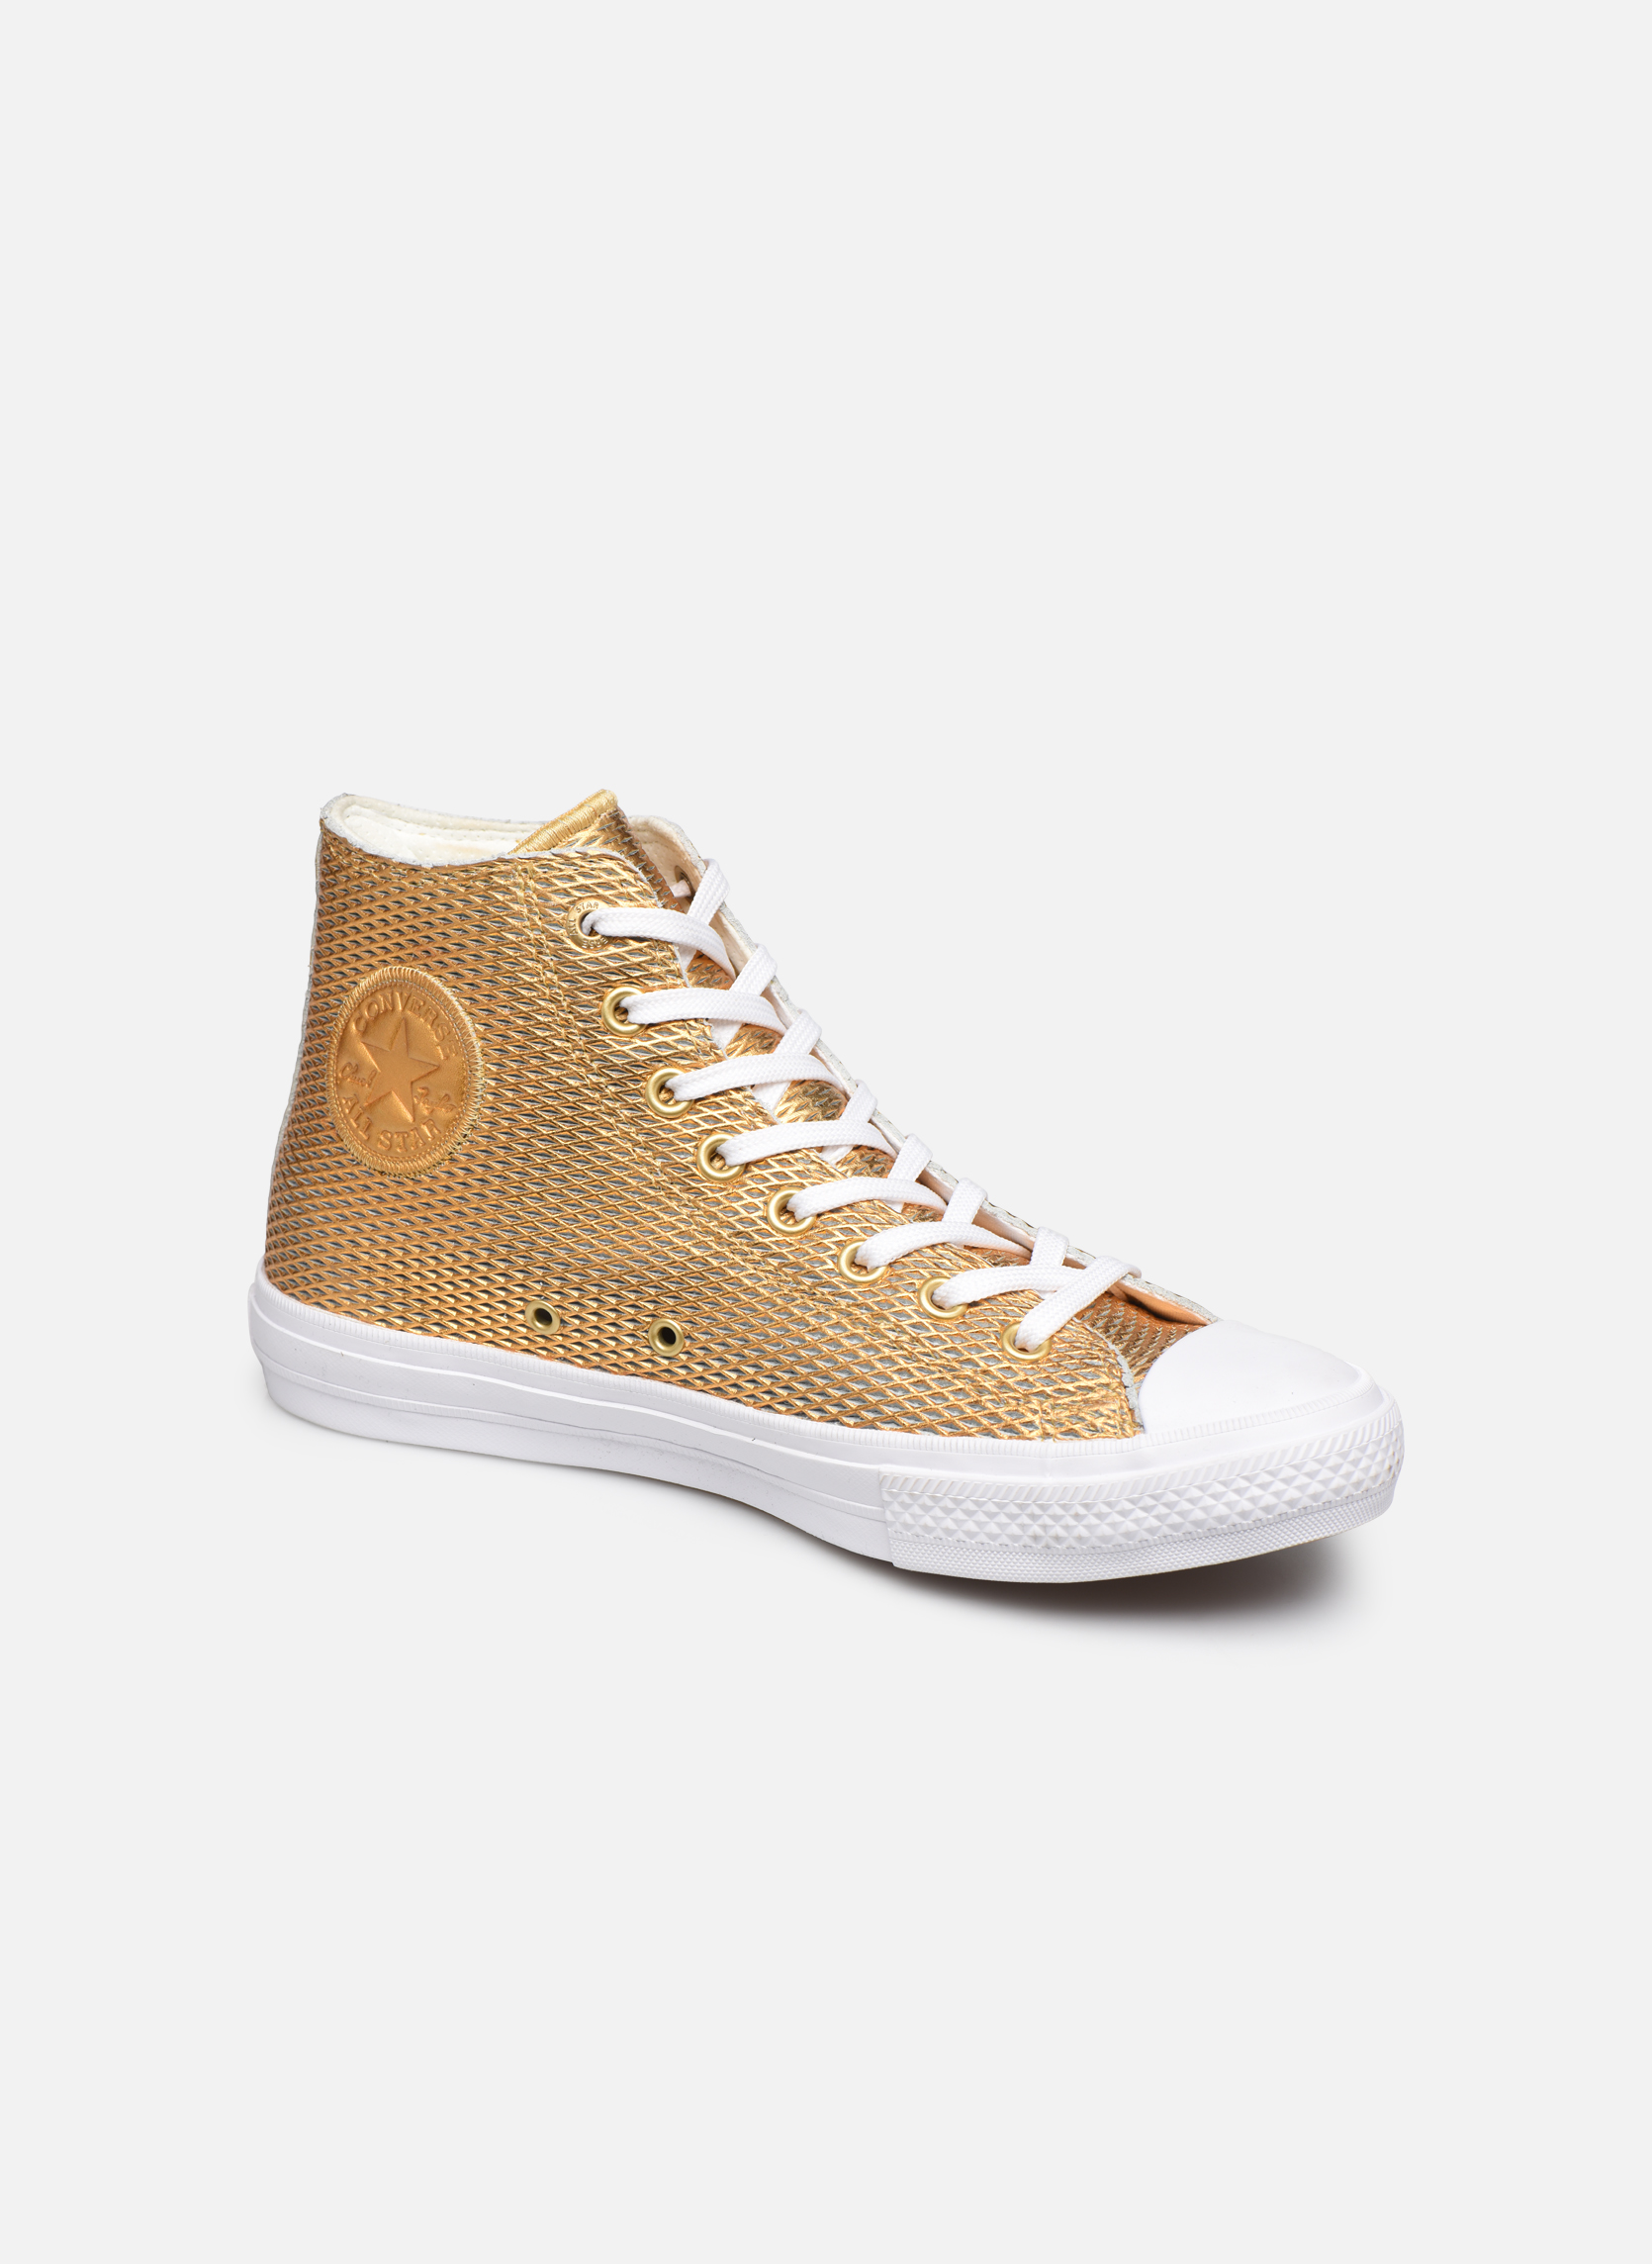 Baskets Converse Chuck Taylor All Star II Hi Perf Metallic Leather Or et bronze vue détail/paire